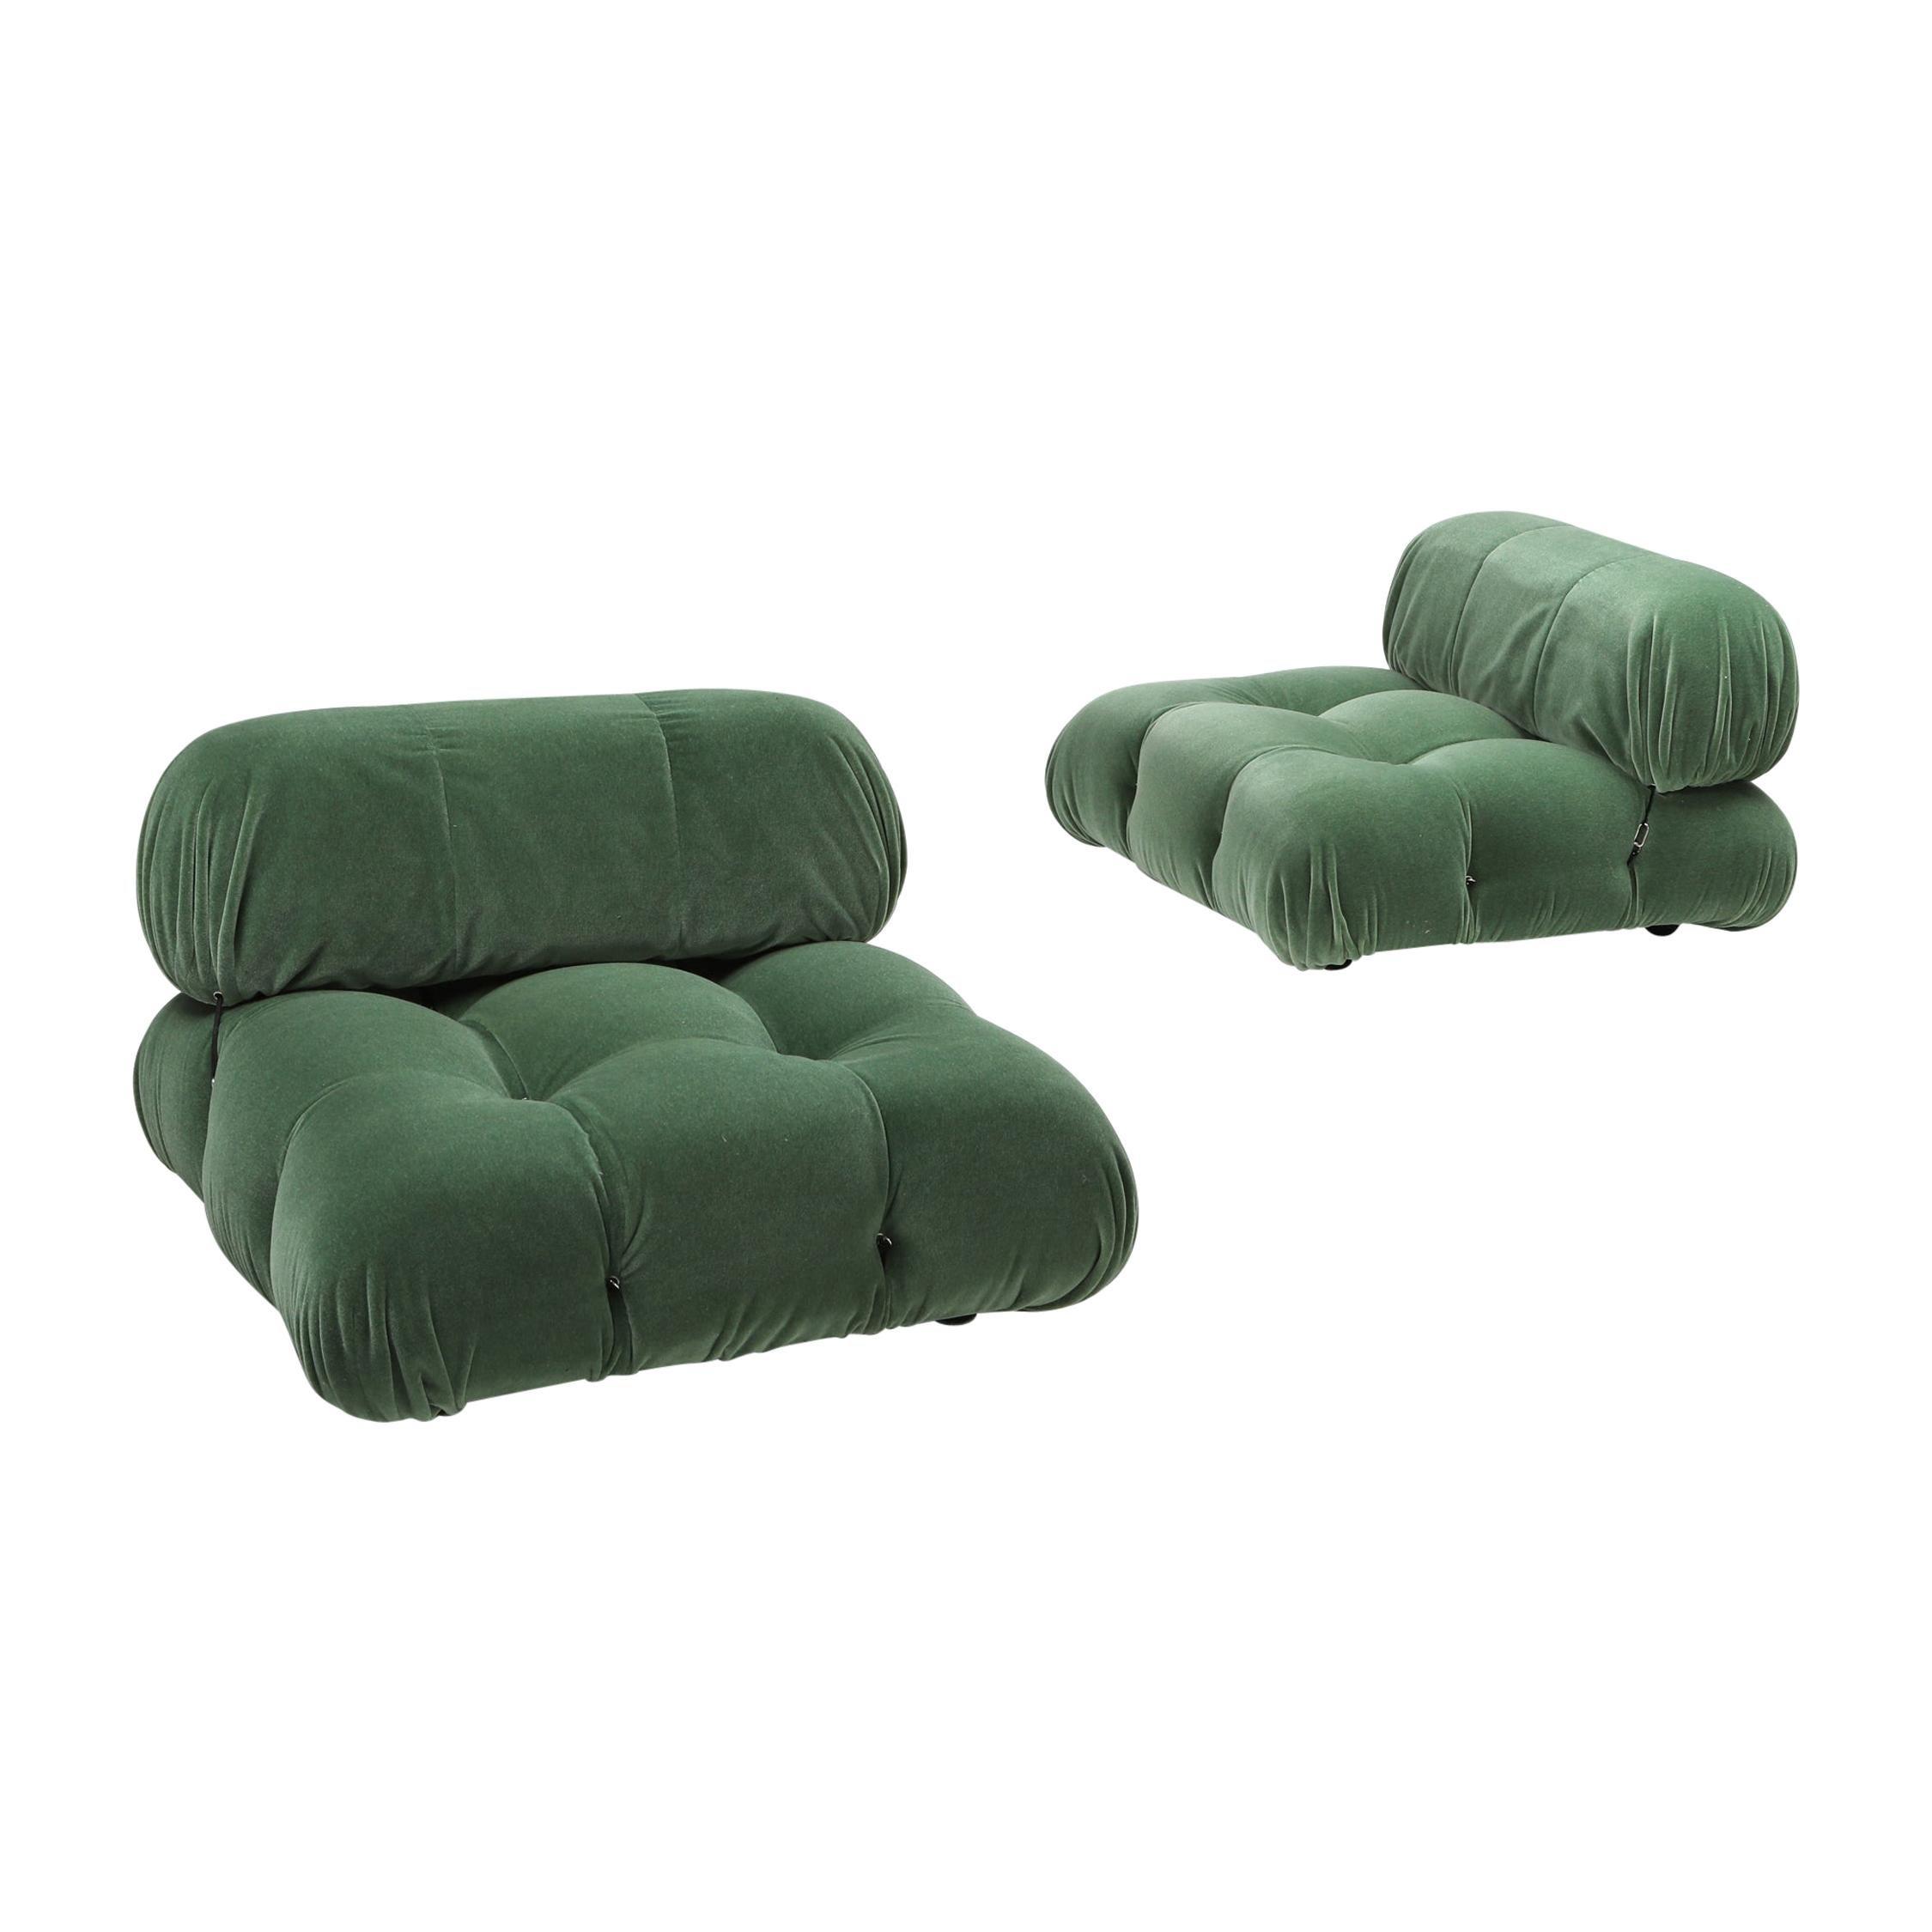 Mario Bellini Camaleonda Lounge Chair in Pierre Frey Mohair